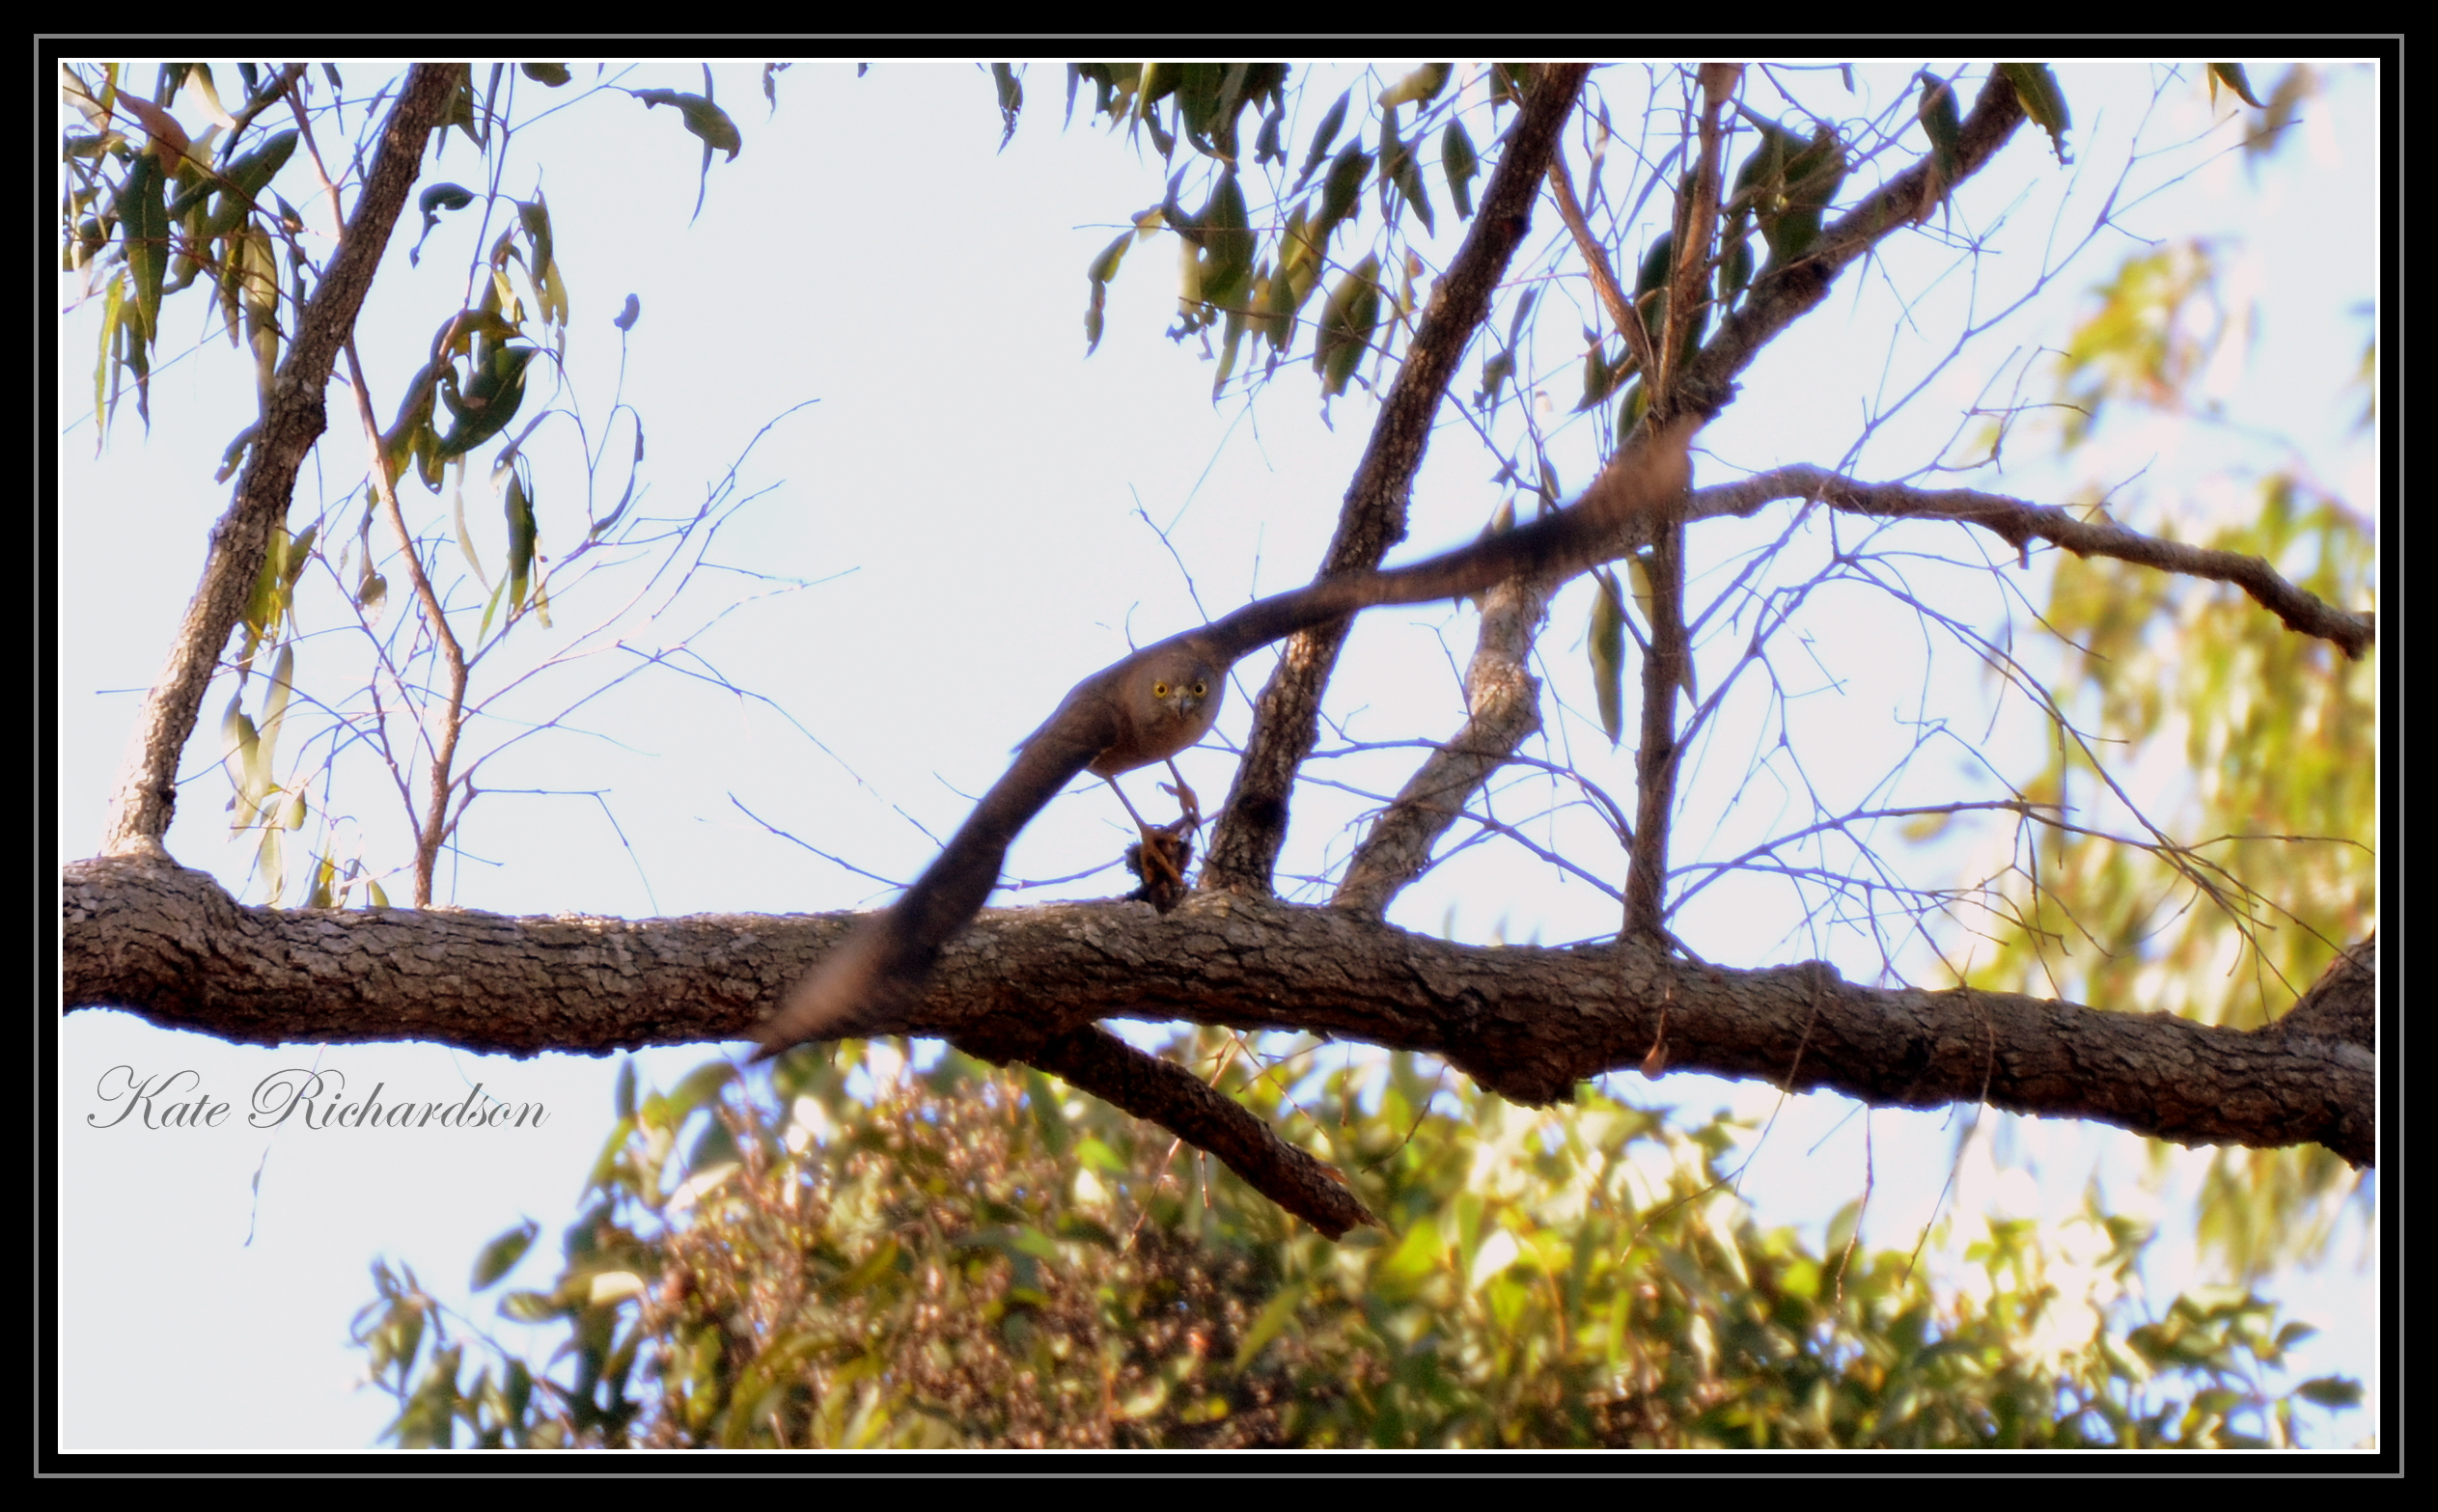 Collard sparrow hawk 2 by DesignKReations